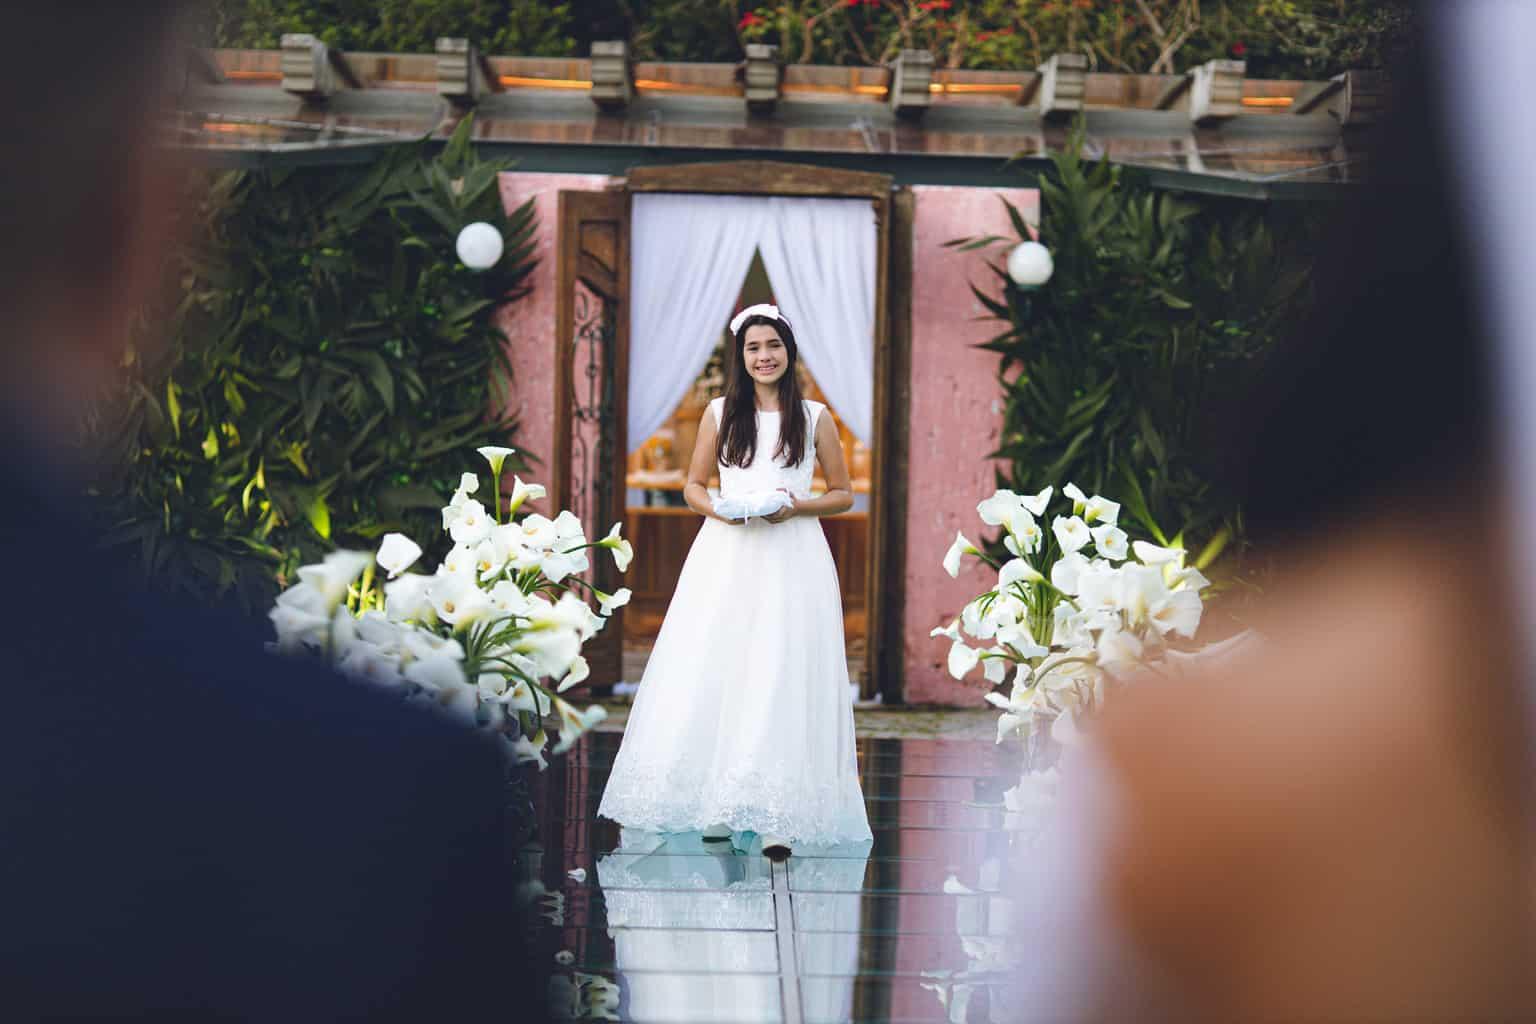 Casamento-de-Bianka-e-Nilo-Fotografia-Marcelo-Schmoeller-SC-Alameda-Casa-Rosa-03082019_bianka-e-nilo_1727